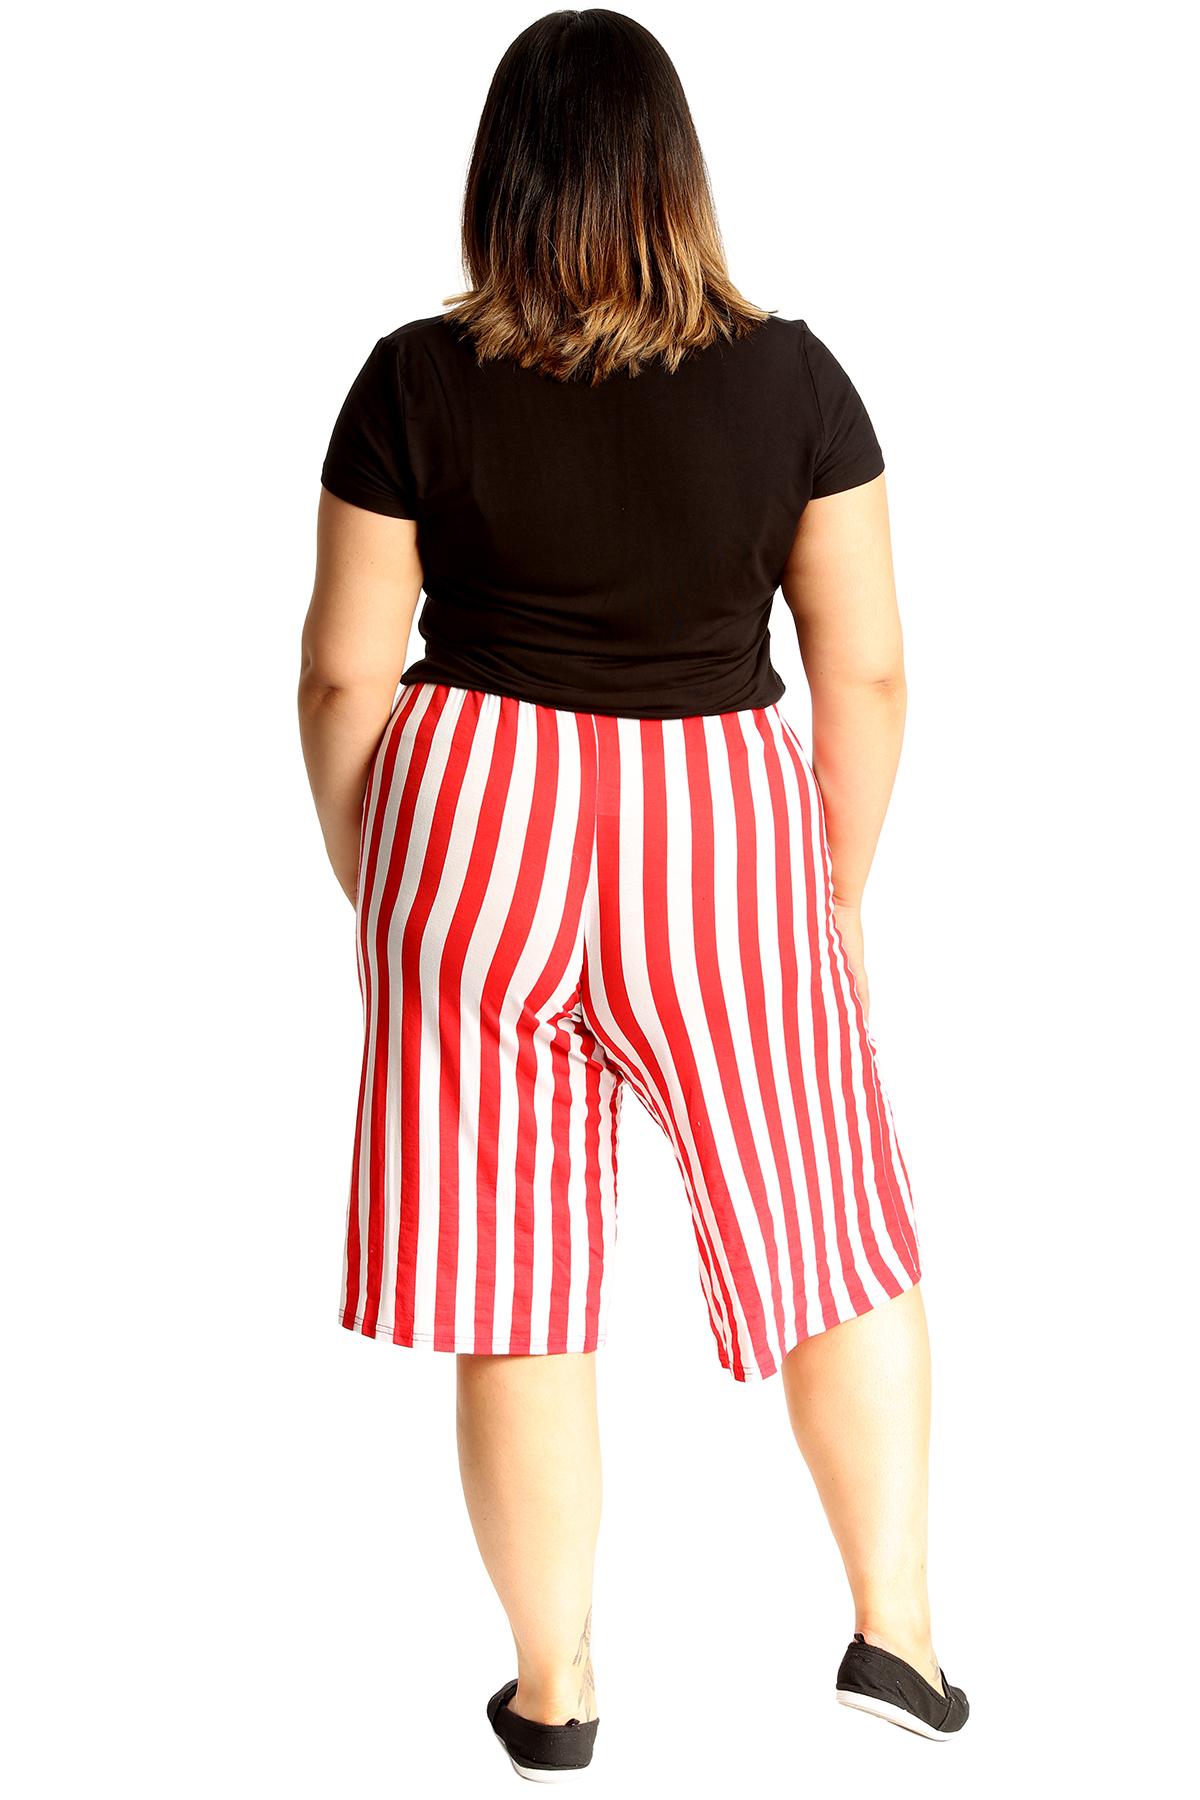 thumbnail 11 - New Womens Plus Size Culottes Ladies Stripe Print Shorts Elastic Waist Wide Leg